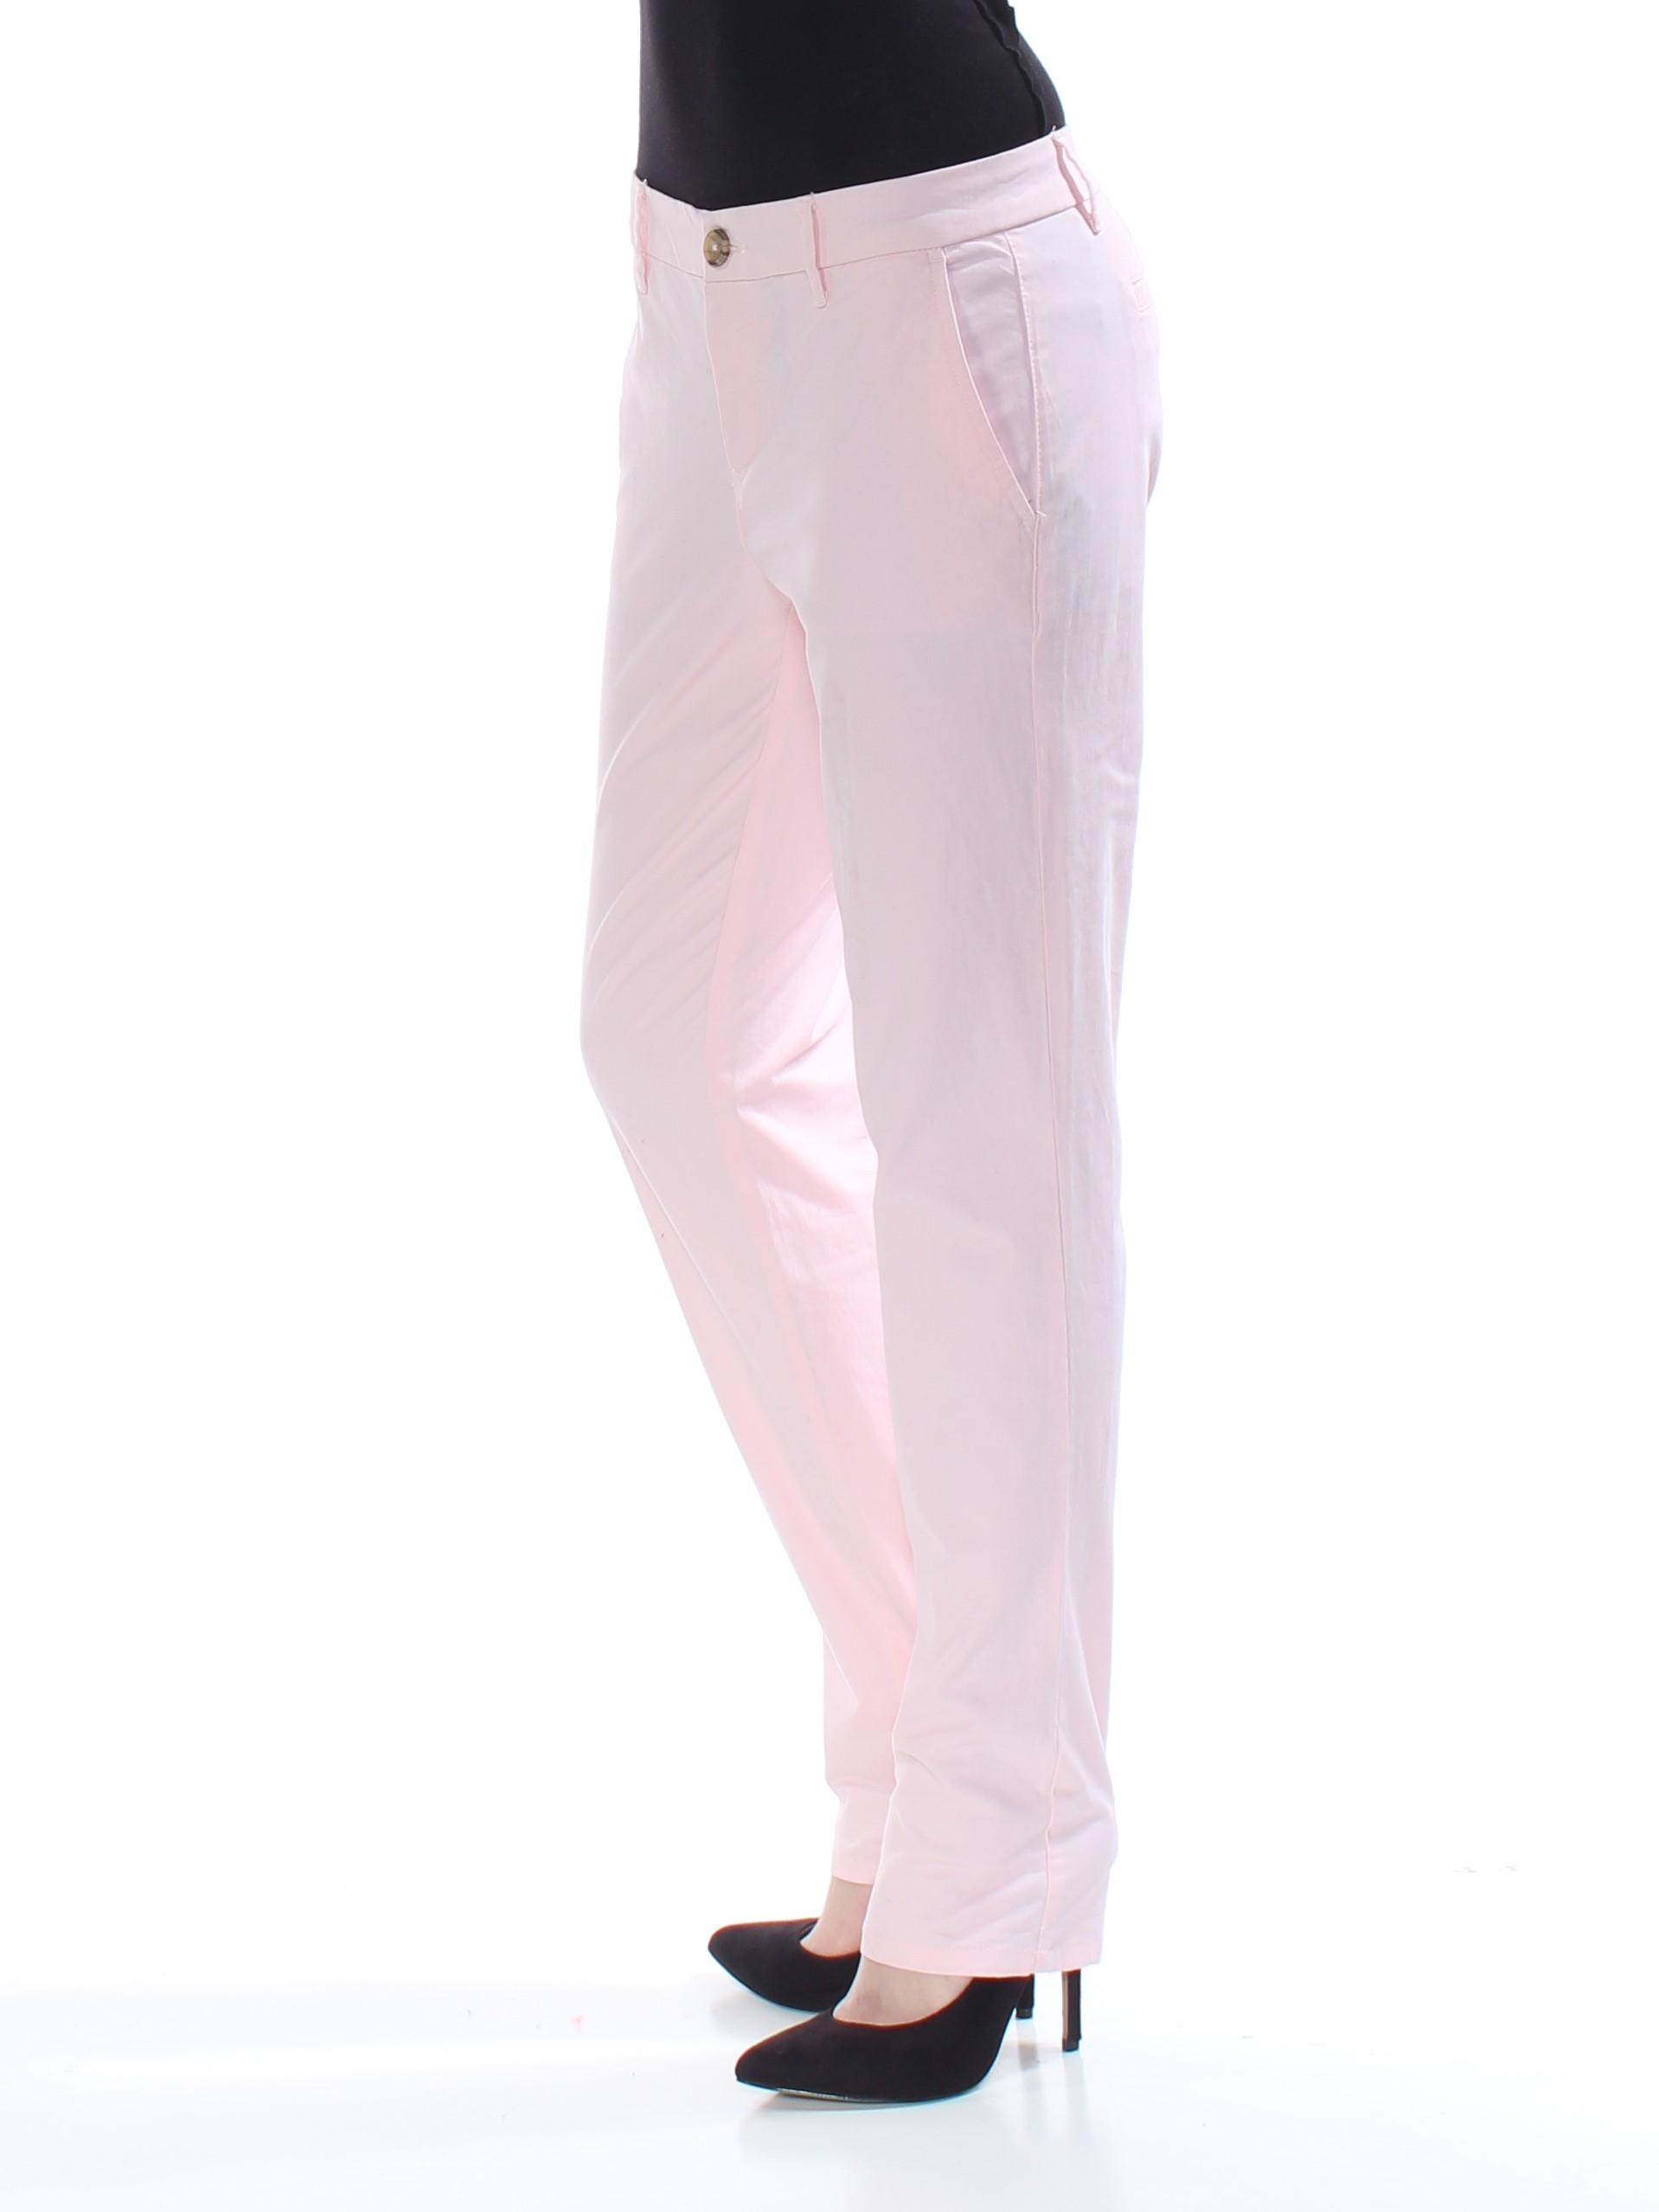 bc8315df TOMMY HILFIGER $60 Womens New 1390 Pink Chino Casual Pants 2 B+B ...